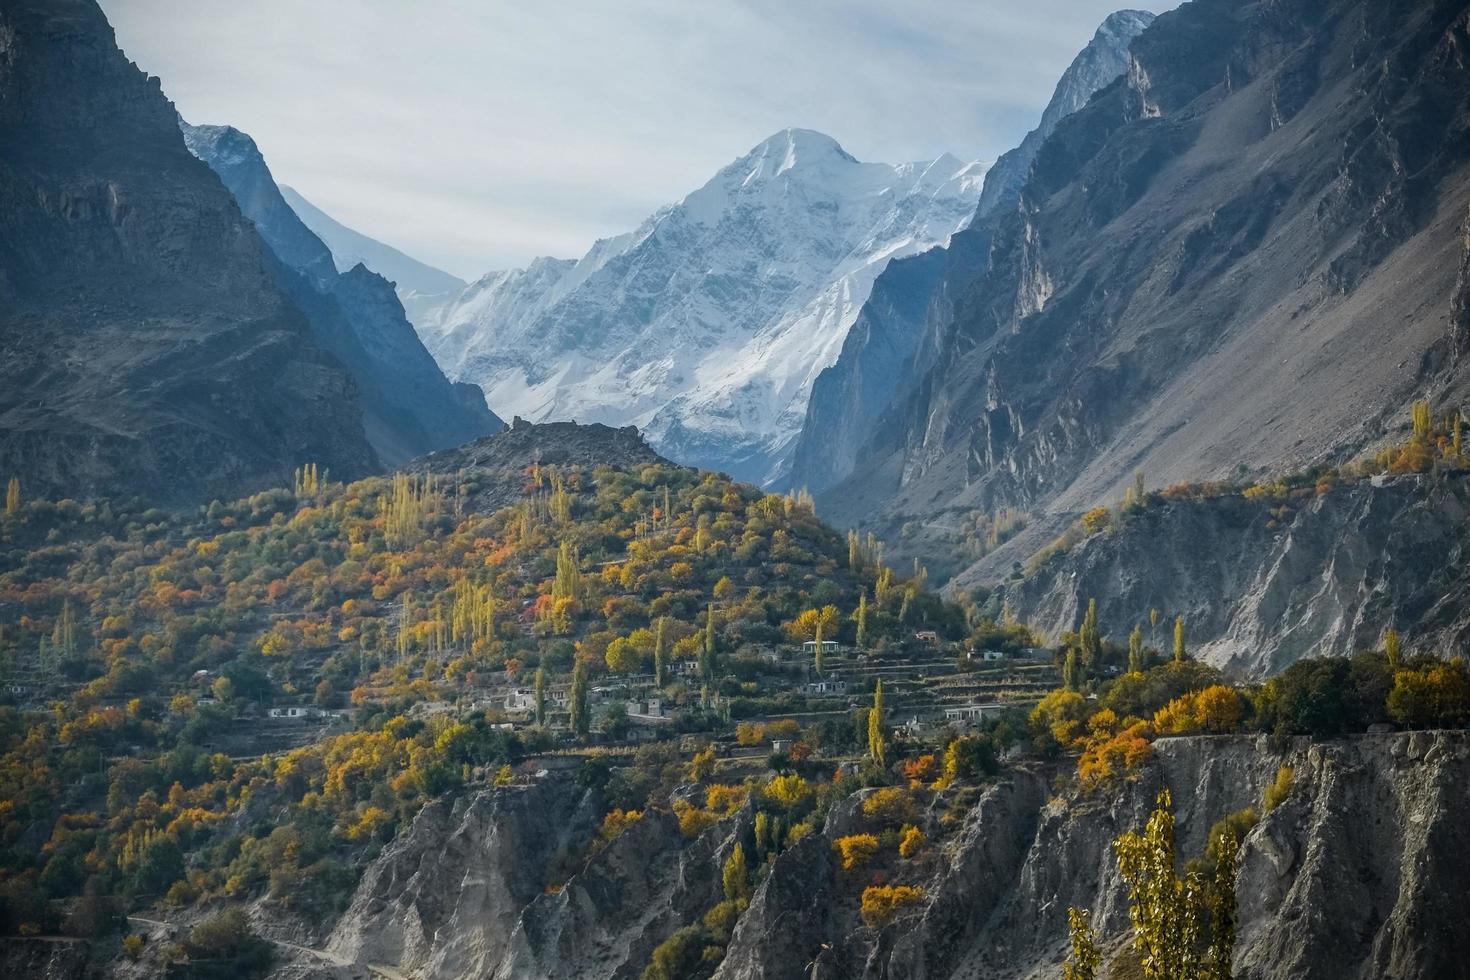 catena montuosa del Karakoram nella valle di Nagar, Pakistan foto